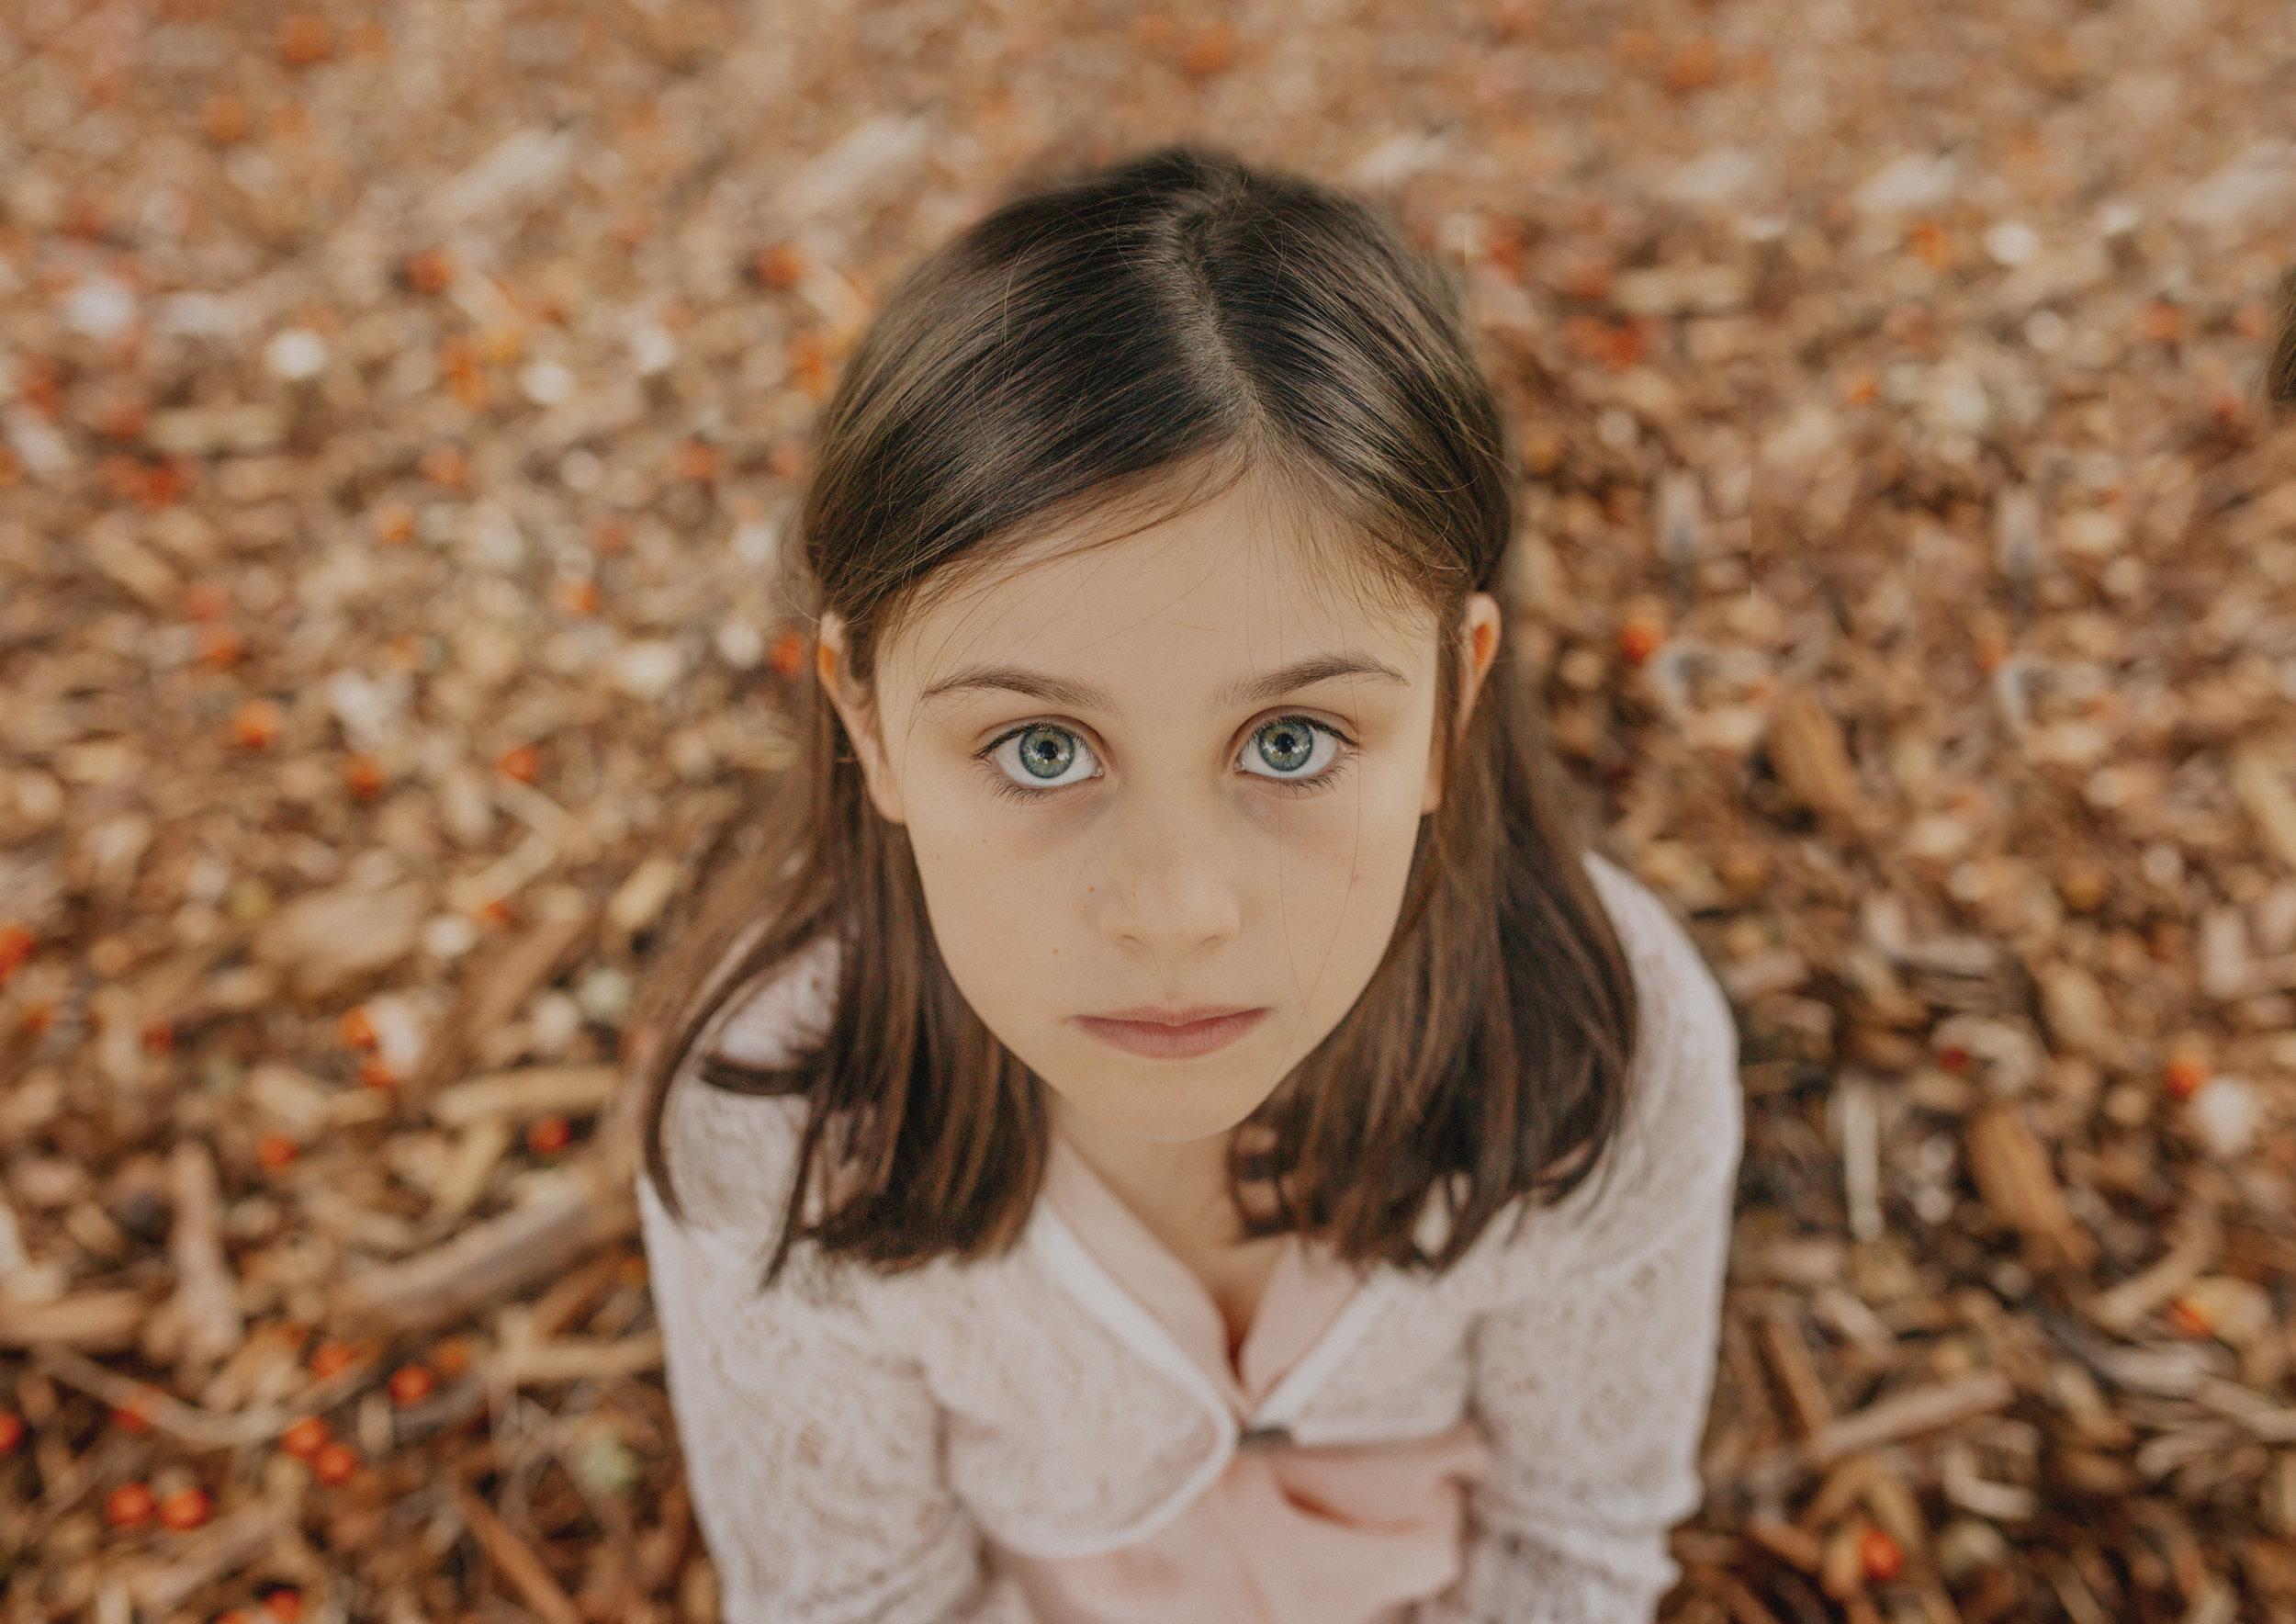 Child Lifestyle Photographer Bayside Melbourne